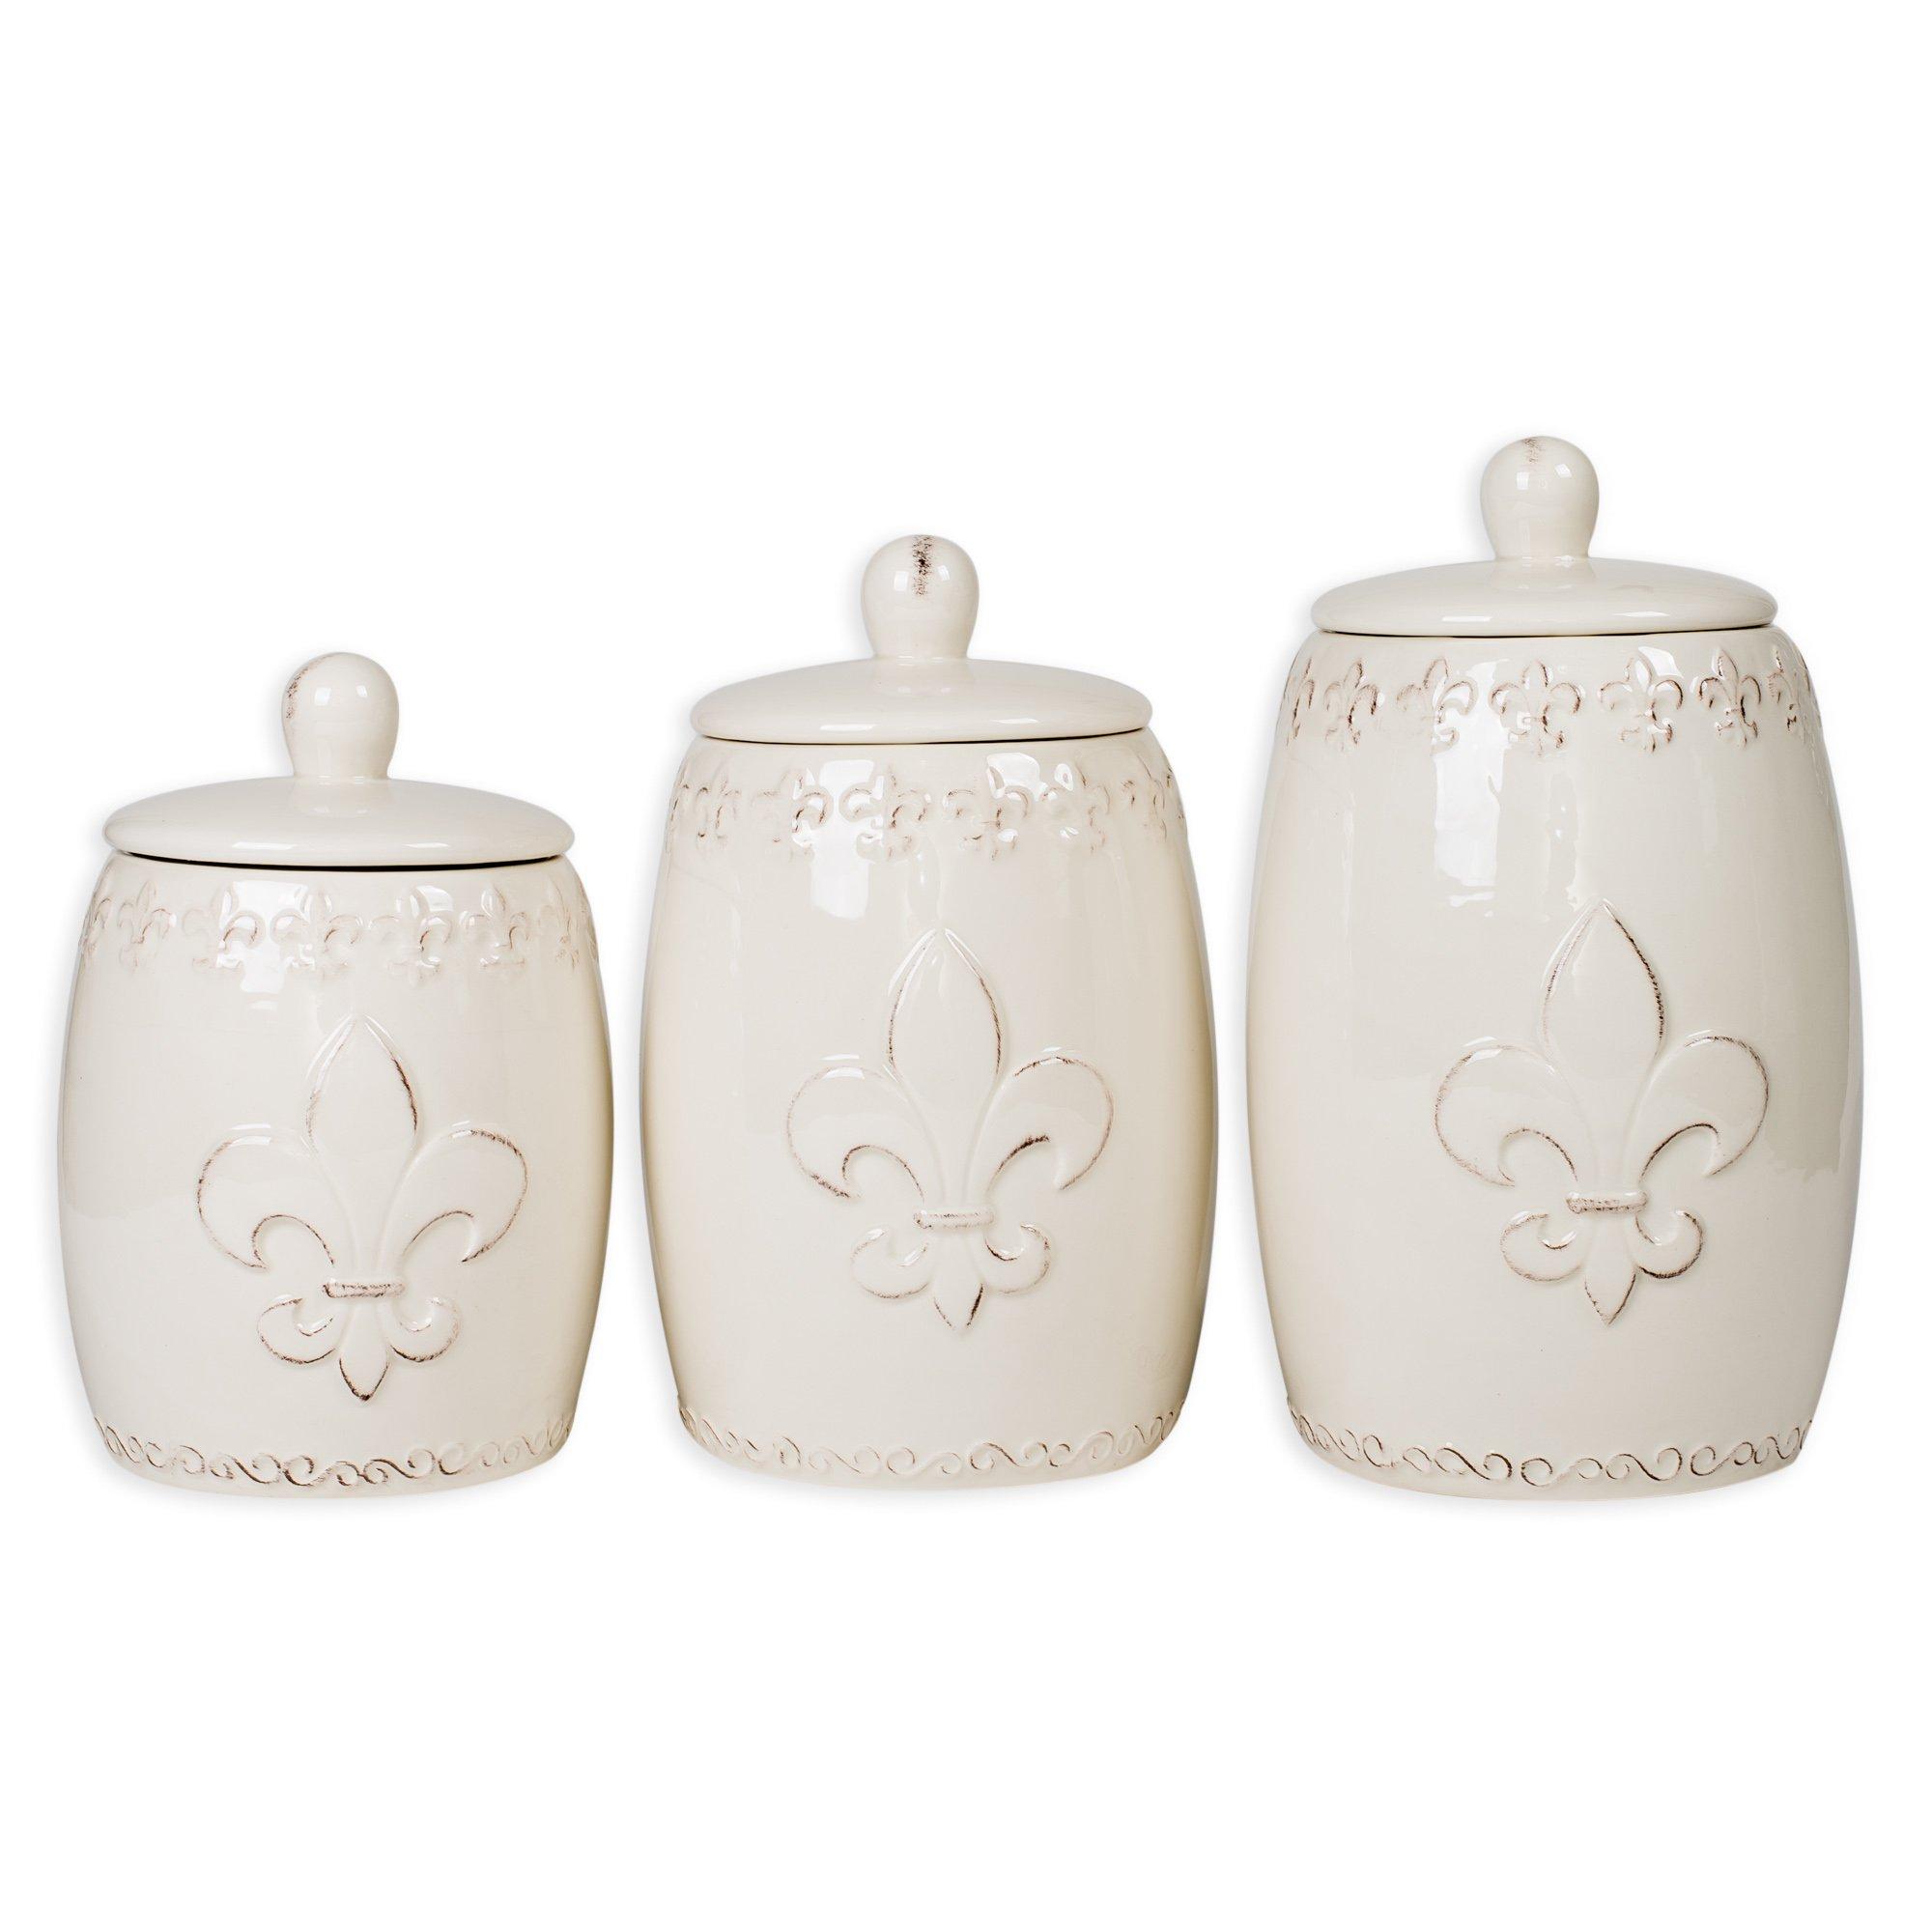 Distressed White Fleur de Lis 3 Pc Ceramic Canister Set